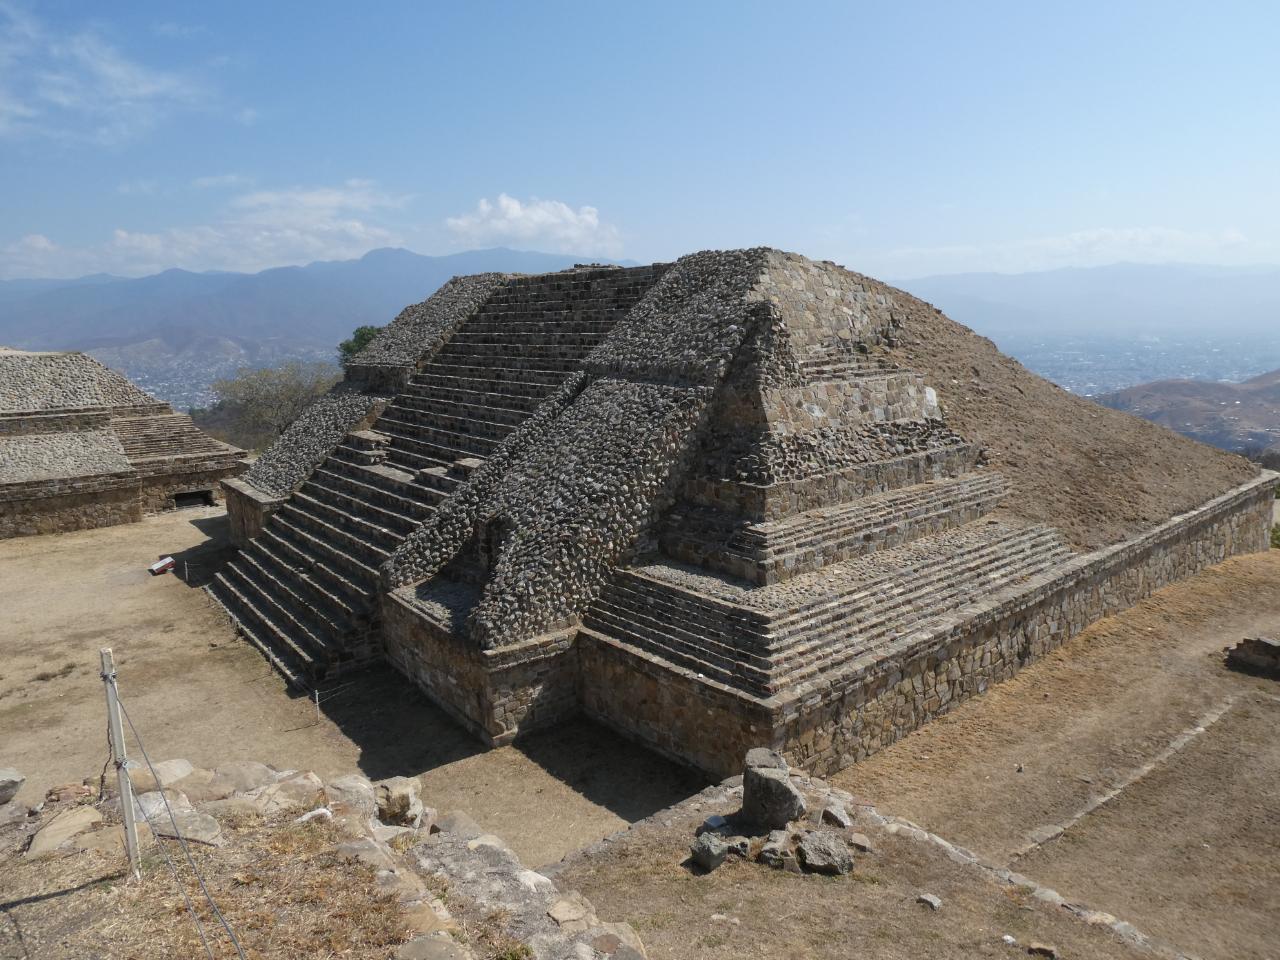 Photo 1: Monte Alban, le grand centre Zapothèque, Mexique